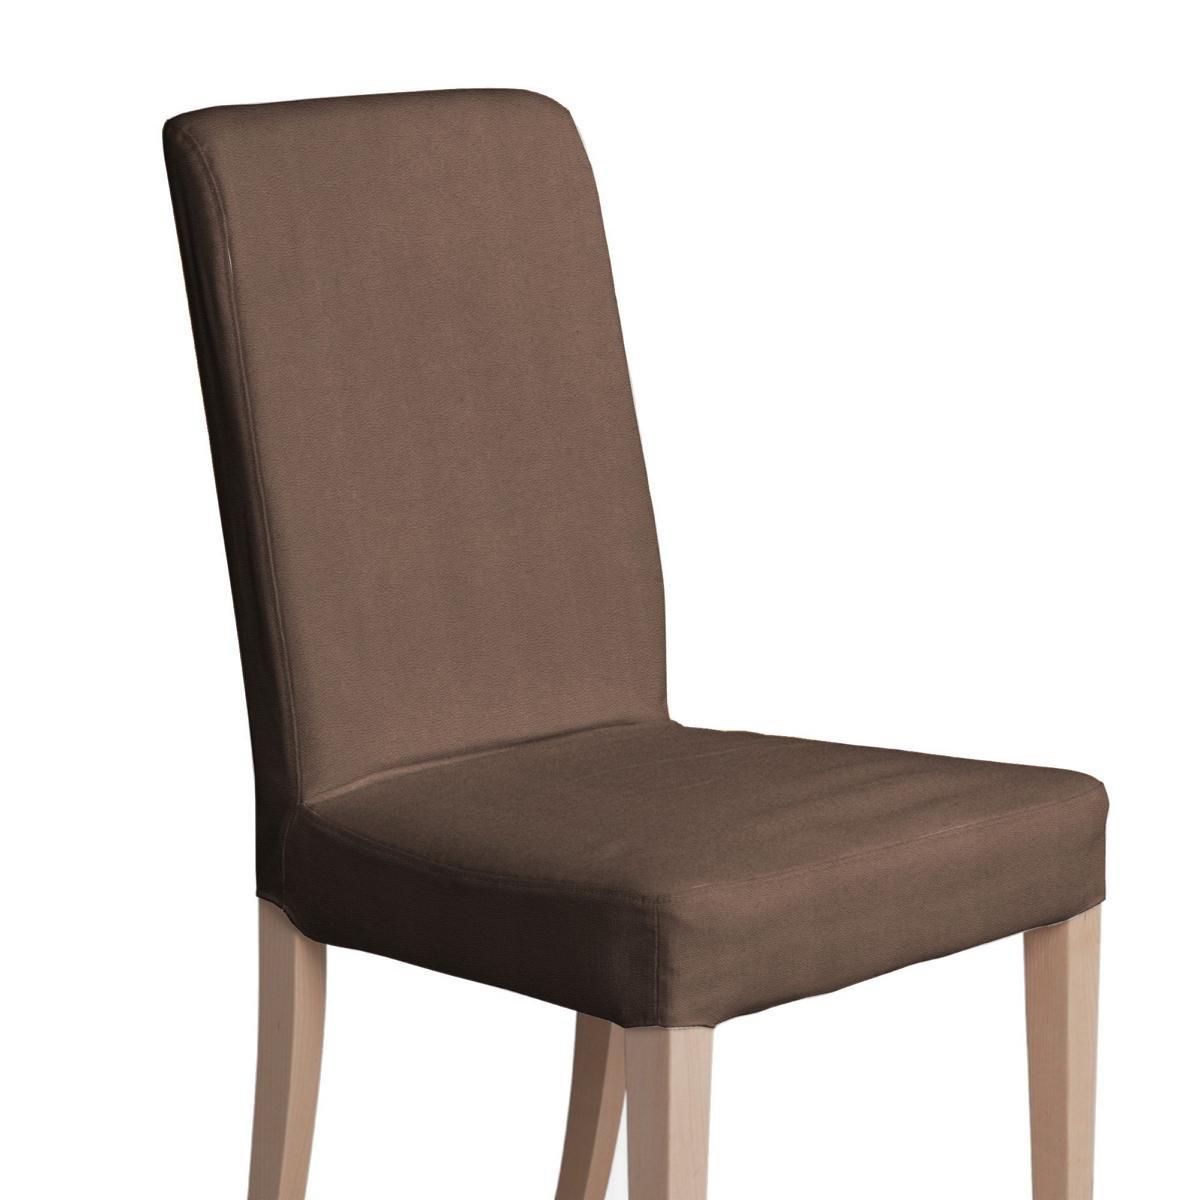 Pimp your Couch Henriksdal Stuhl Bezug - Kunstleder Latigo [Cappuccino]